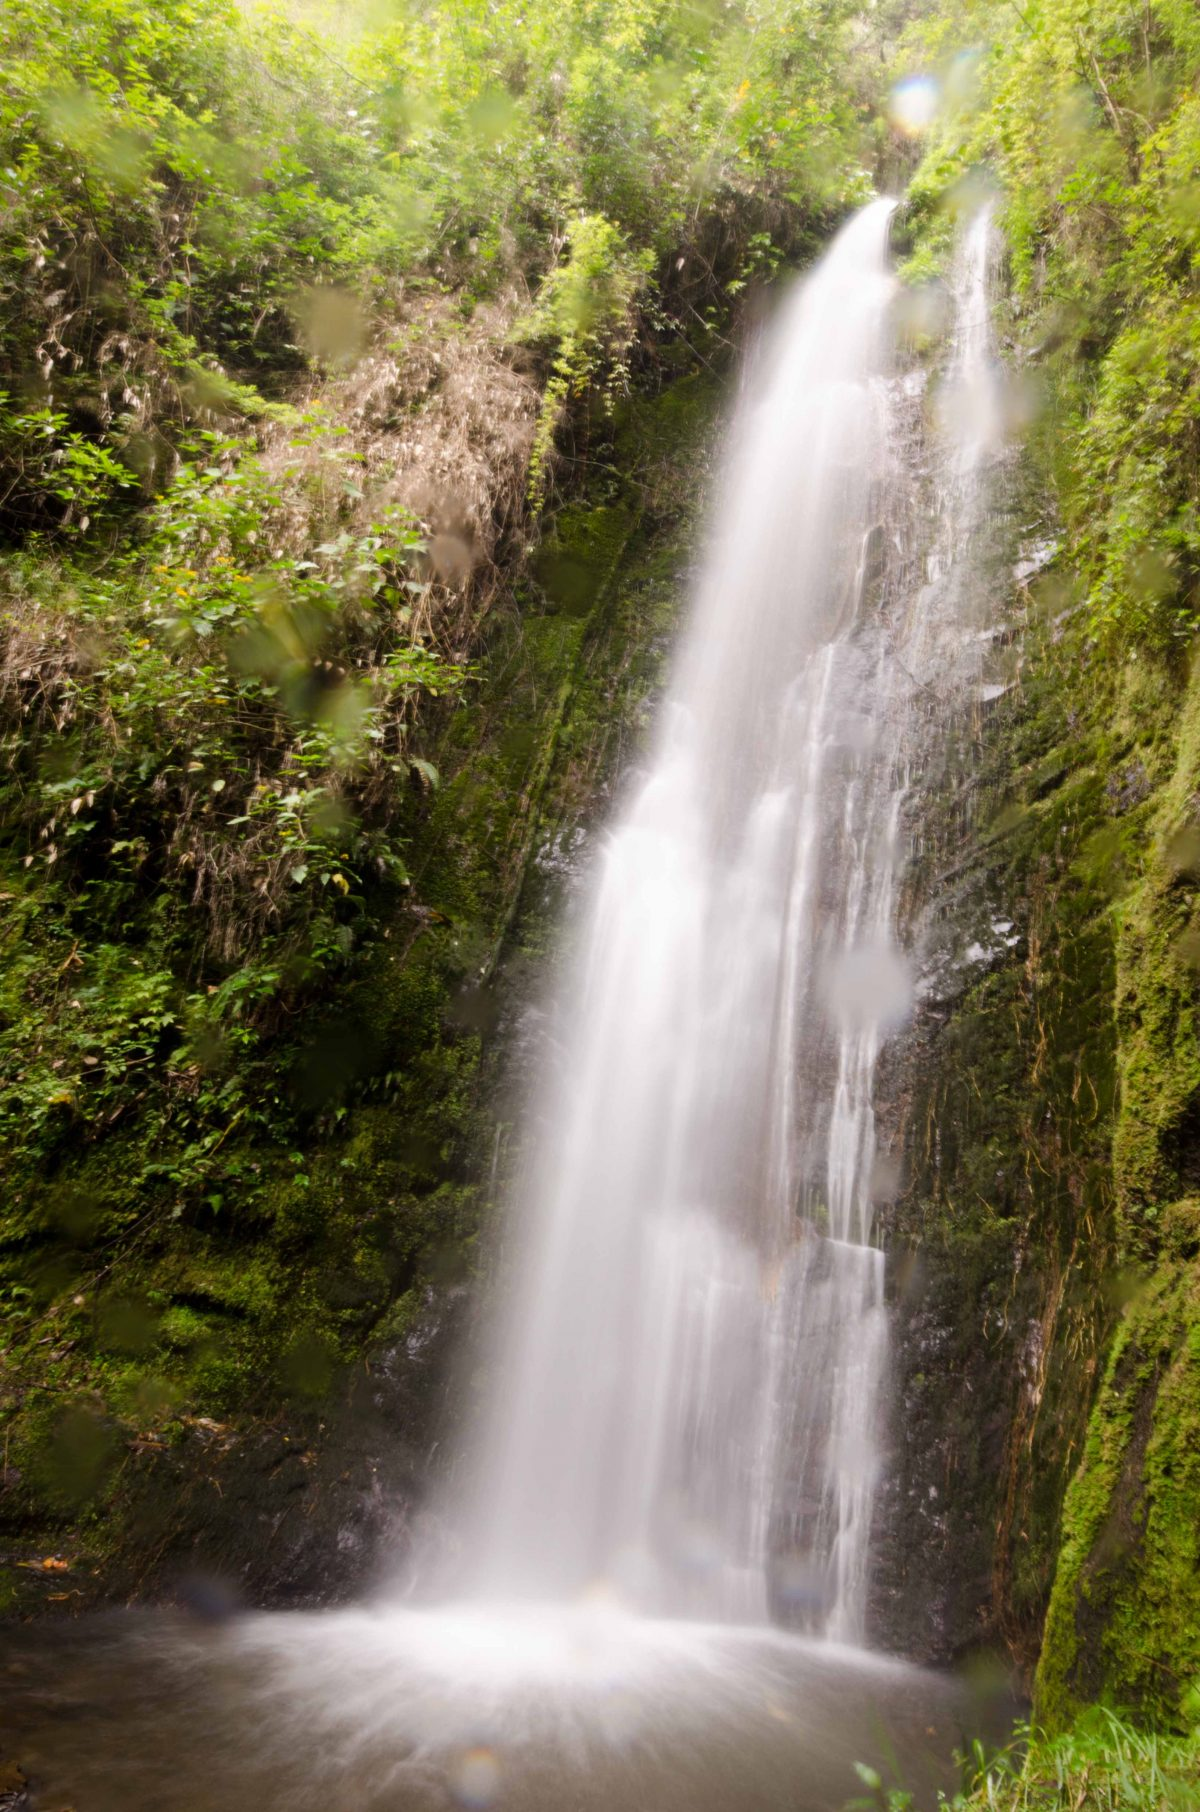 Cascada del Palto, Loja Province, Ecuador